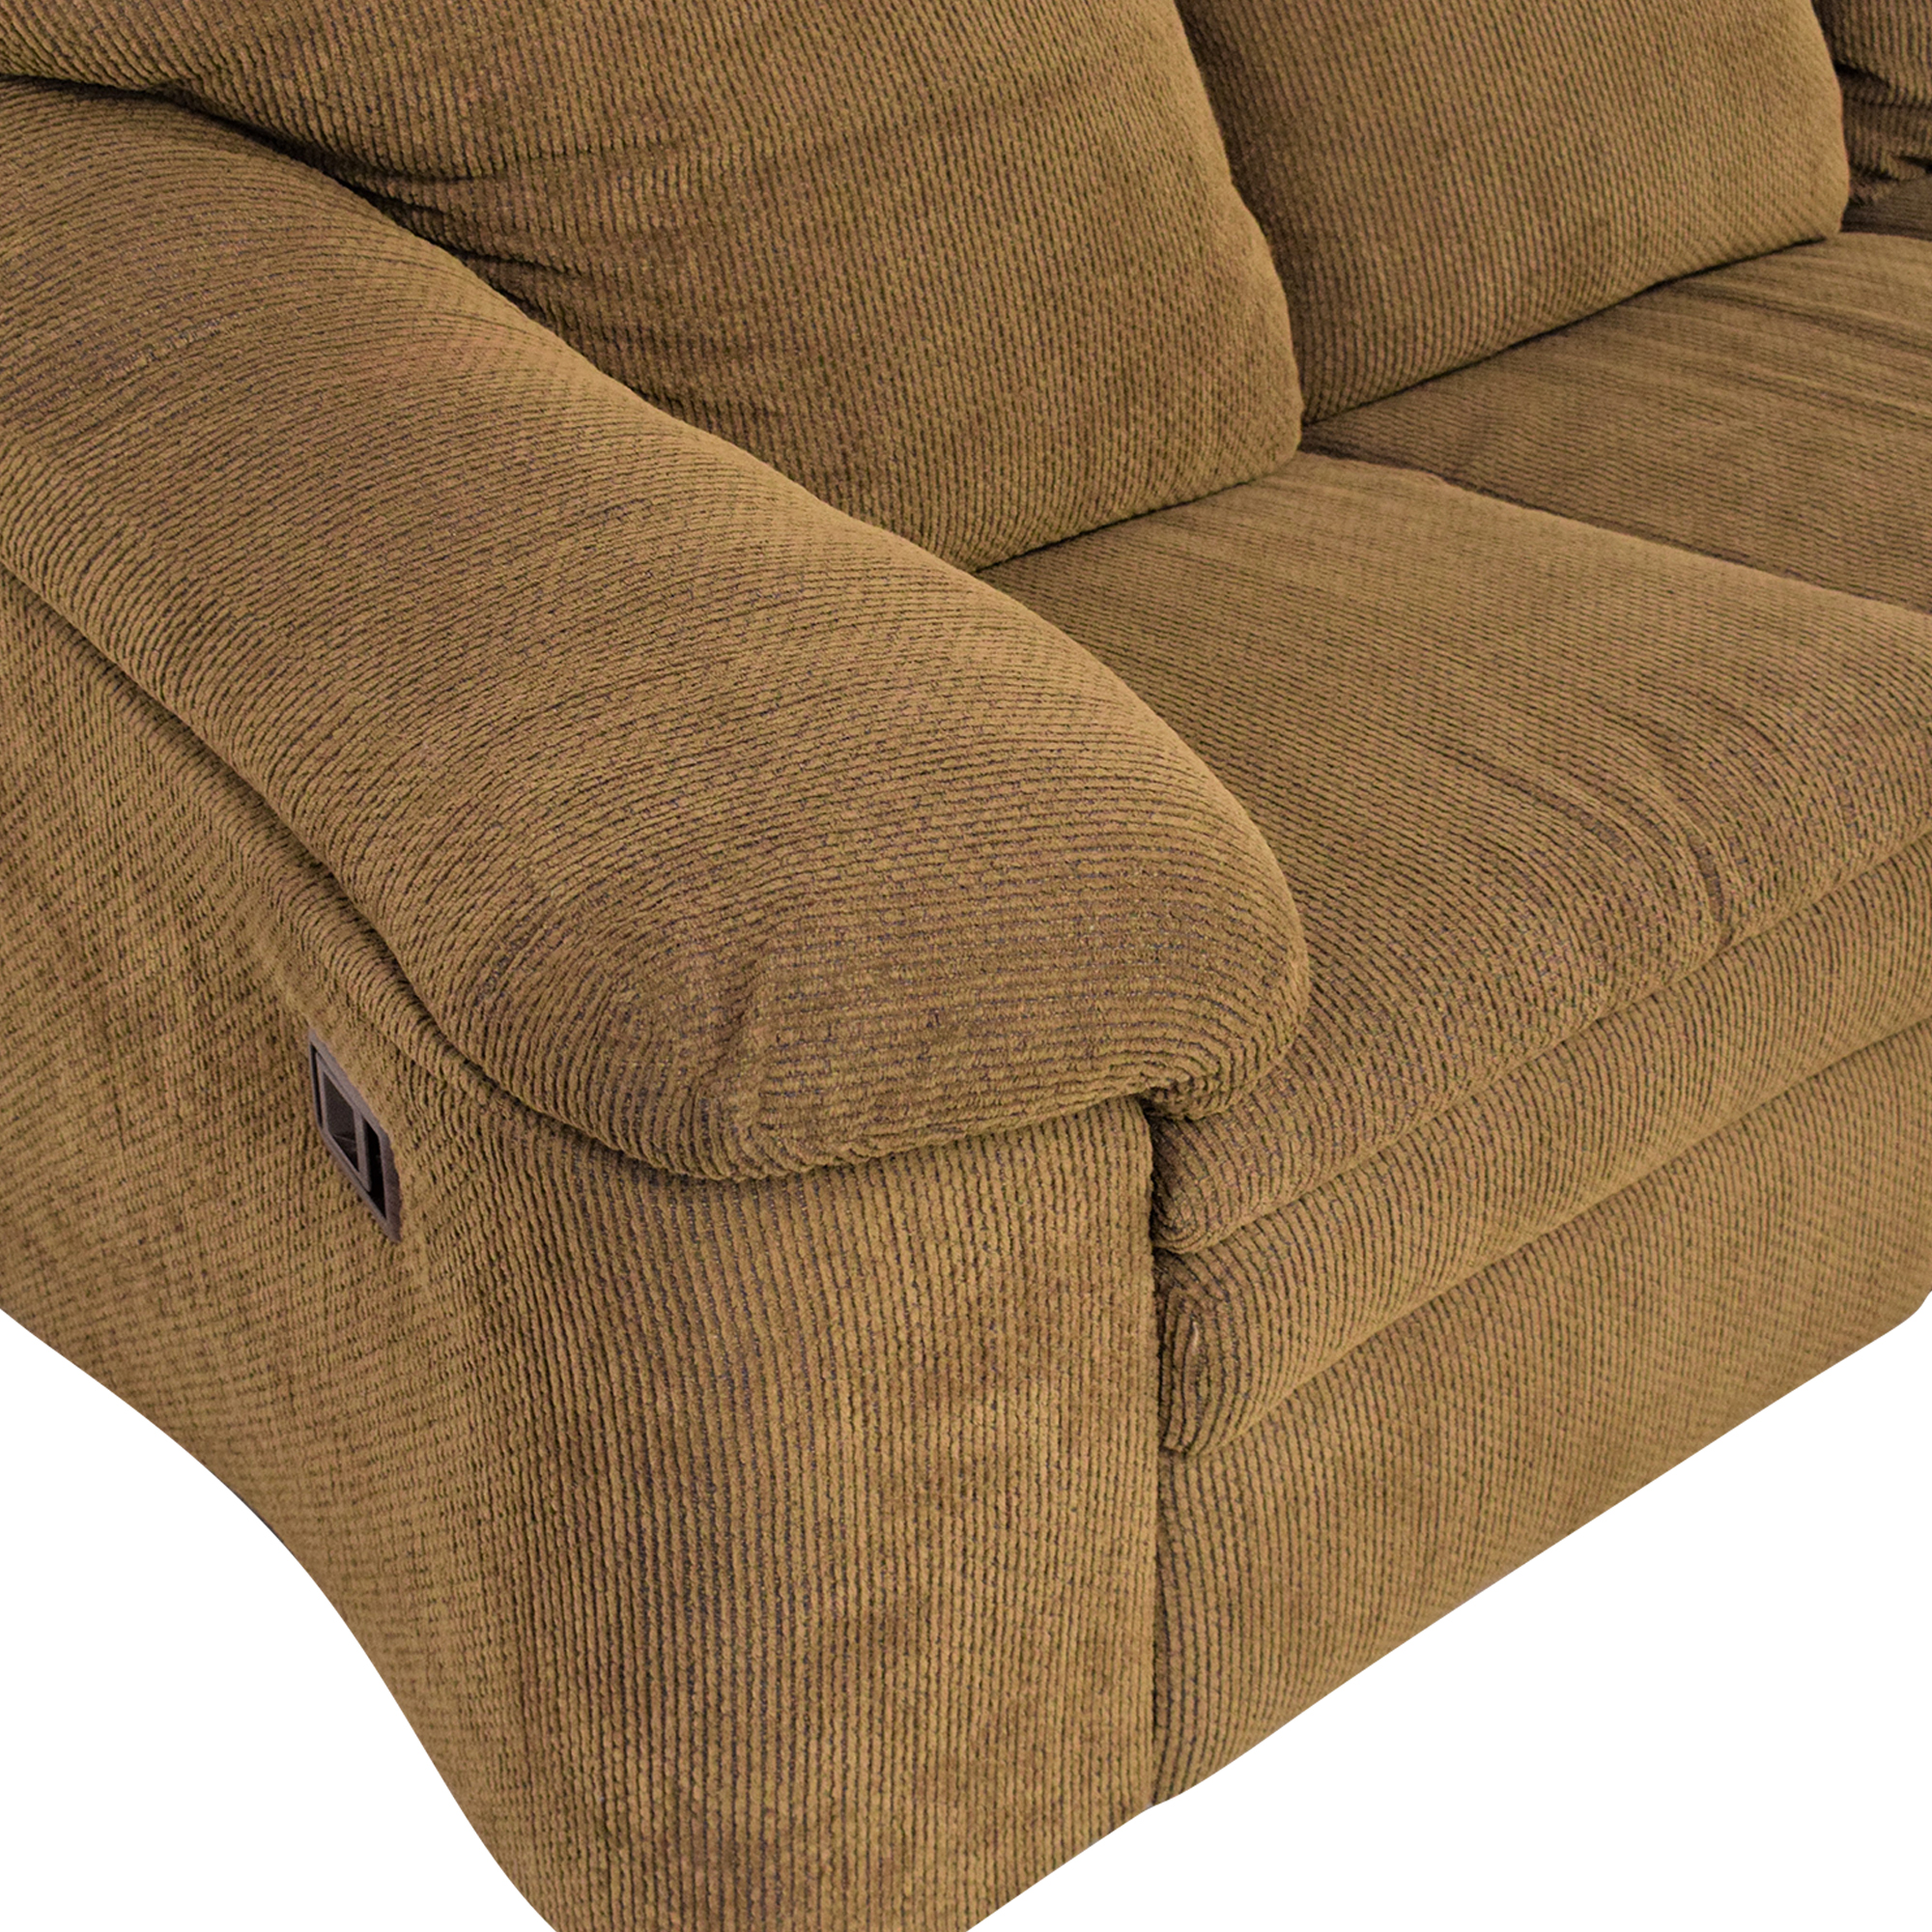 Raymour & Flanigan Sleeper Sofa with Ottoman sale